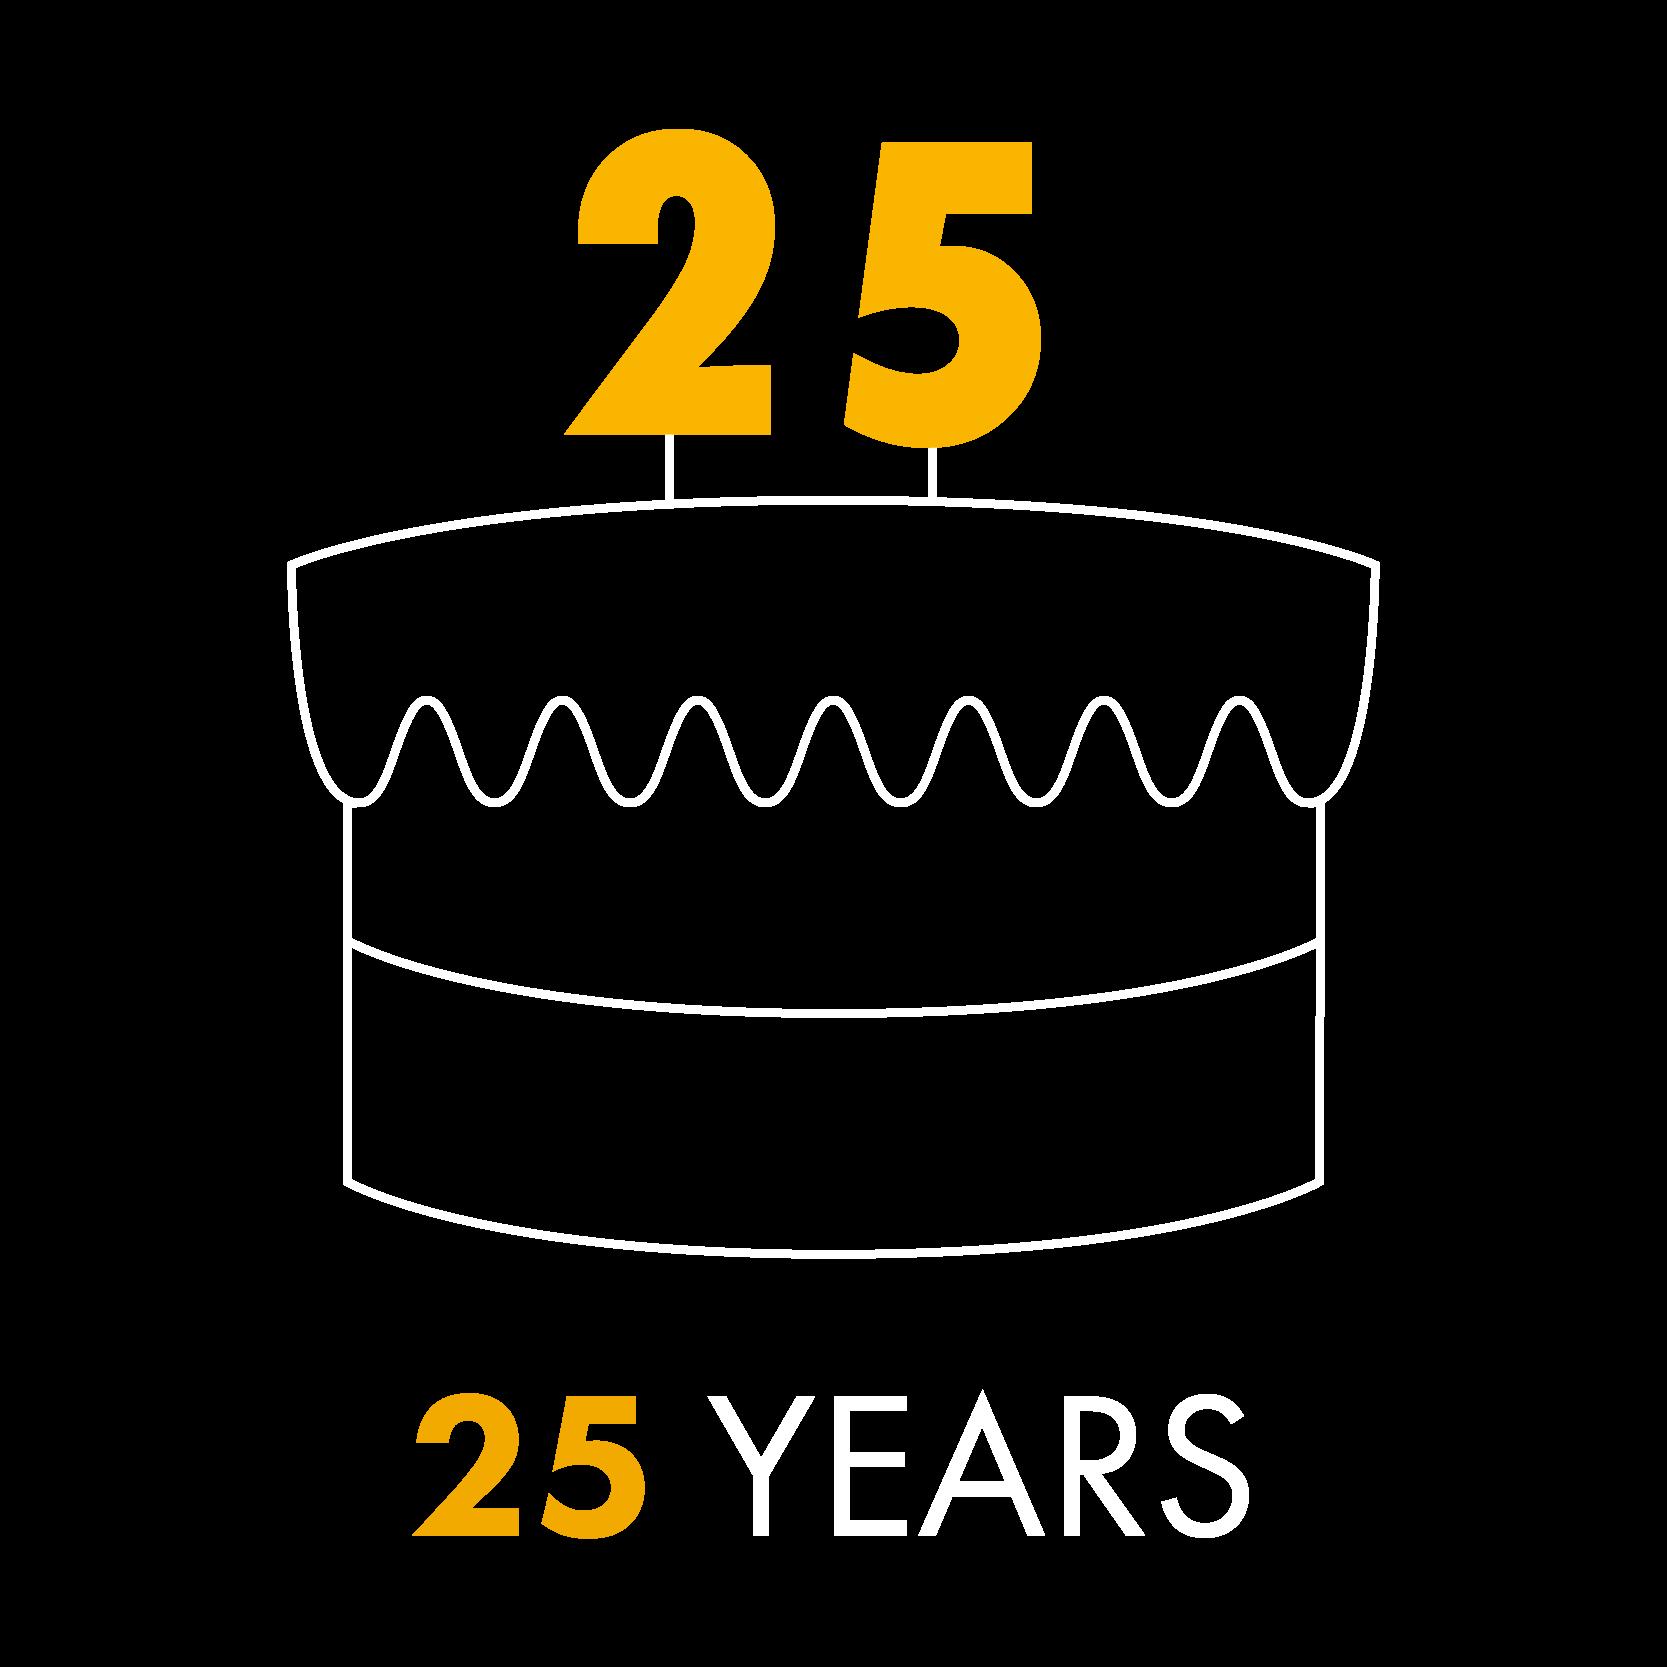 SAT-7 25 years